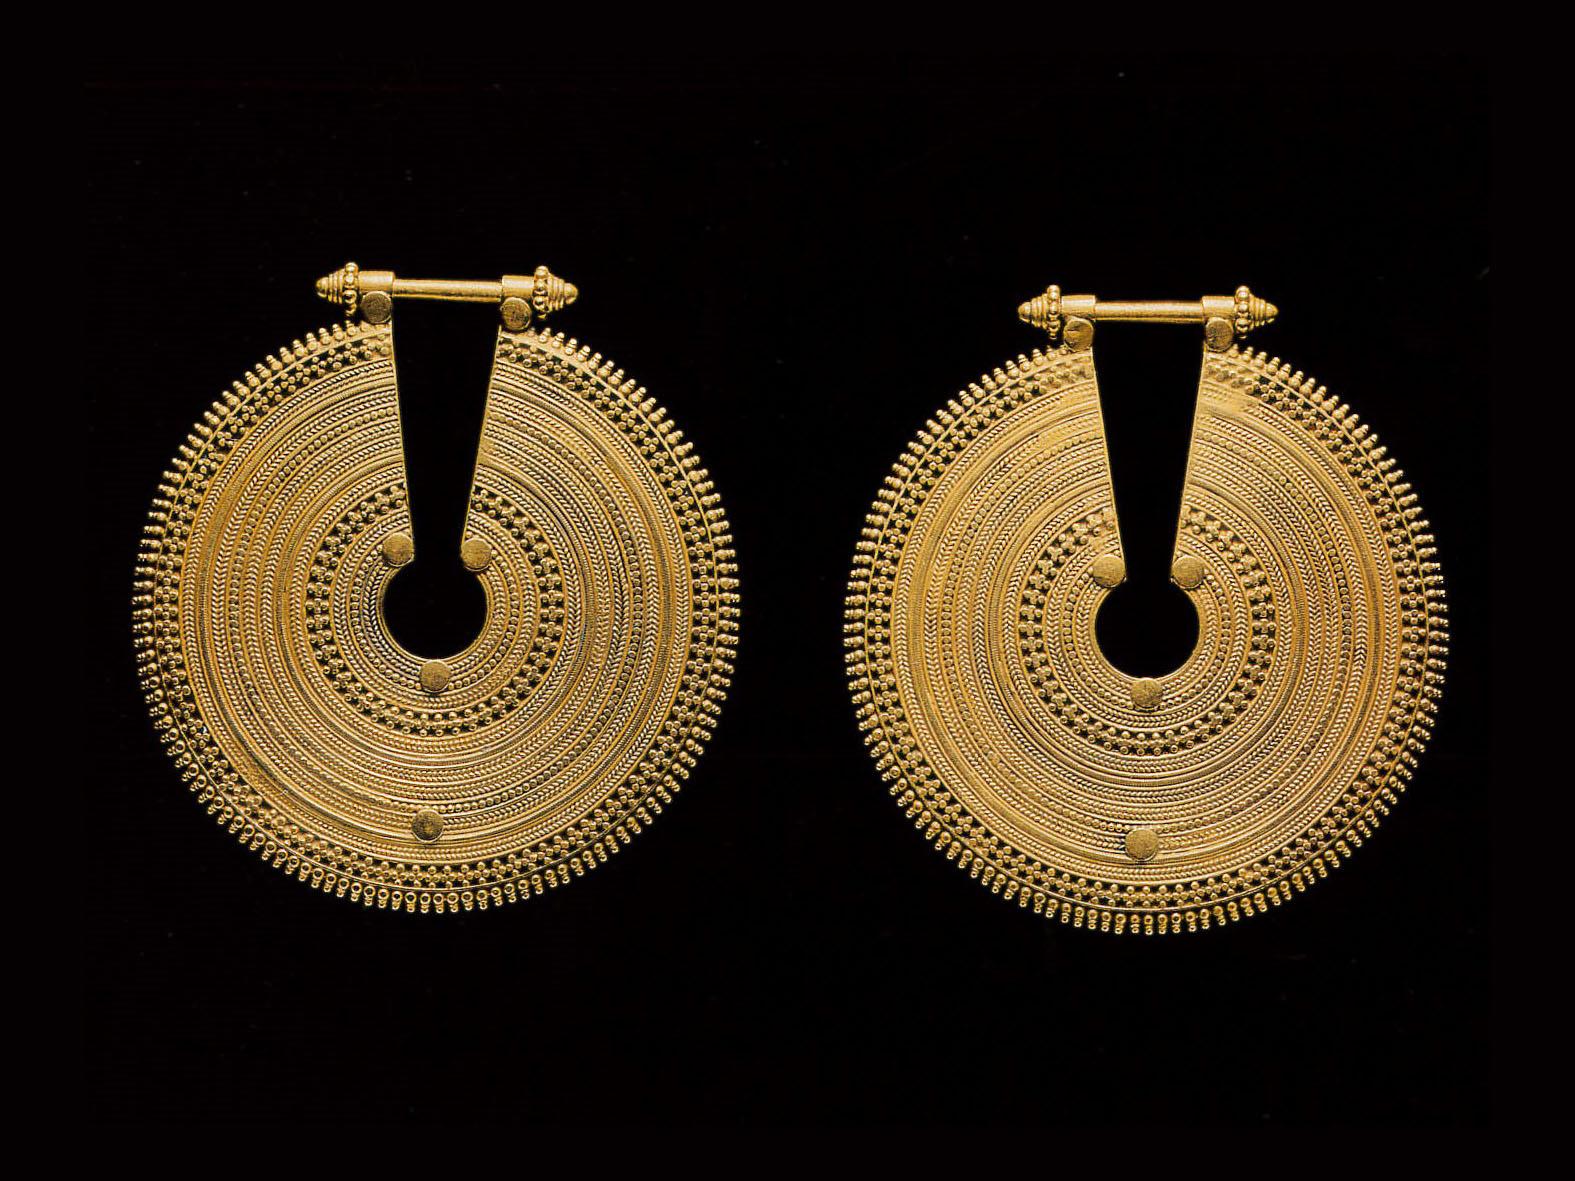 .... Kammal ear ornaments, South India, 20th century ..Ornements d'oreilles kammal, Inde du Sud, XXe siècle ....